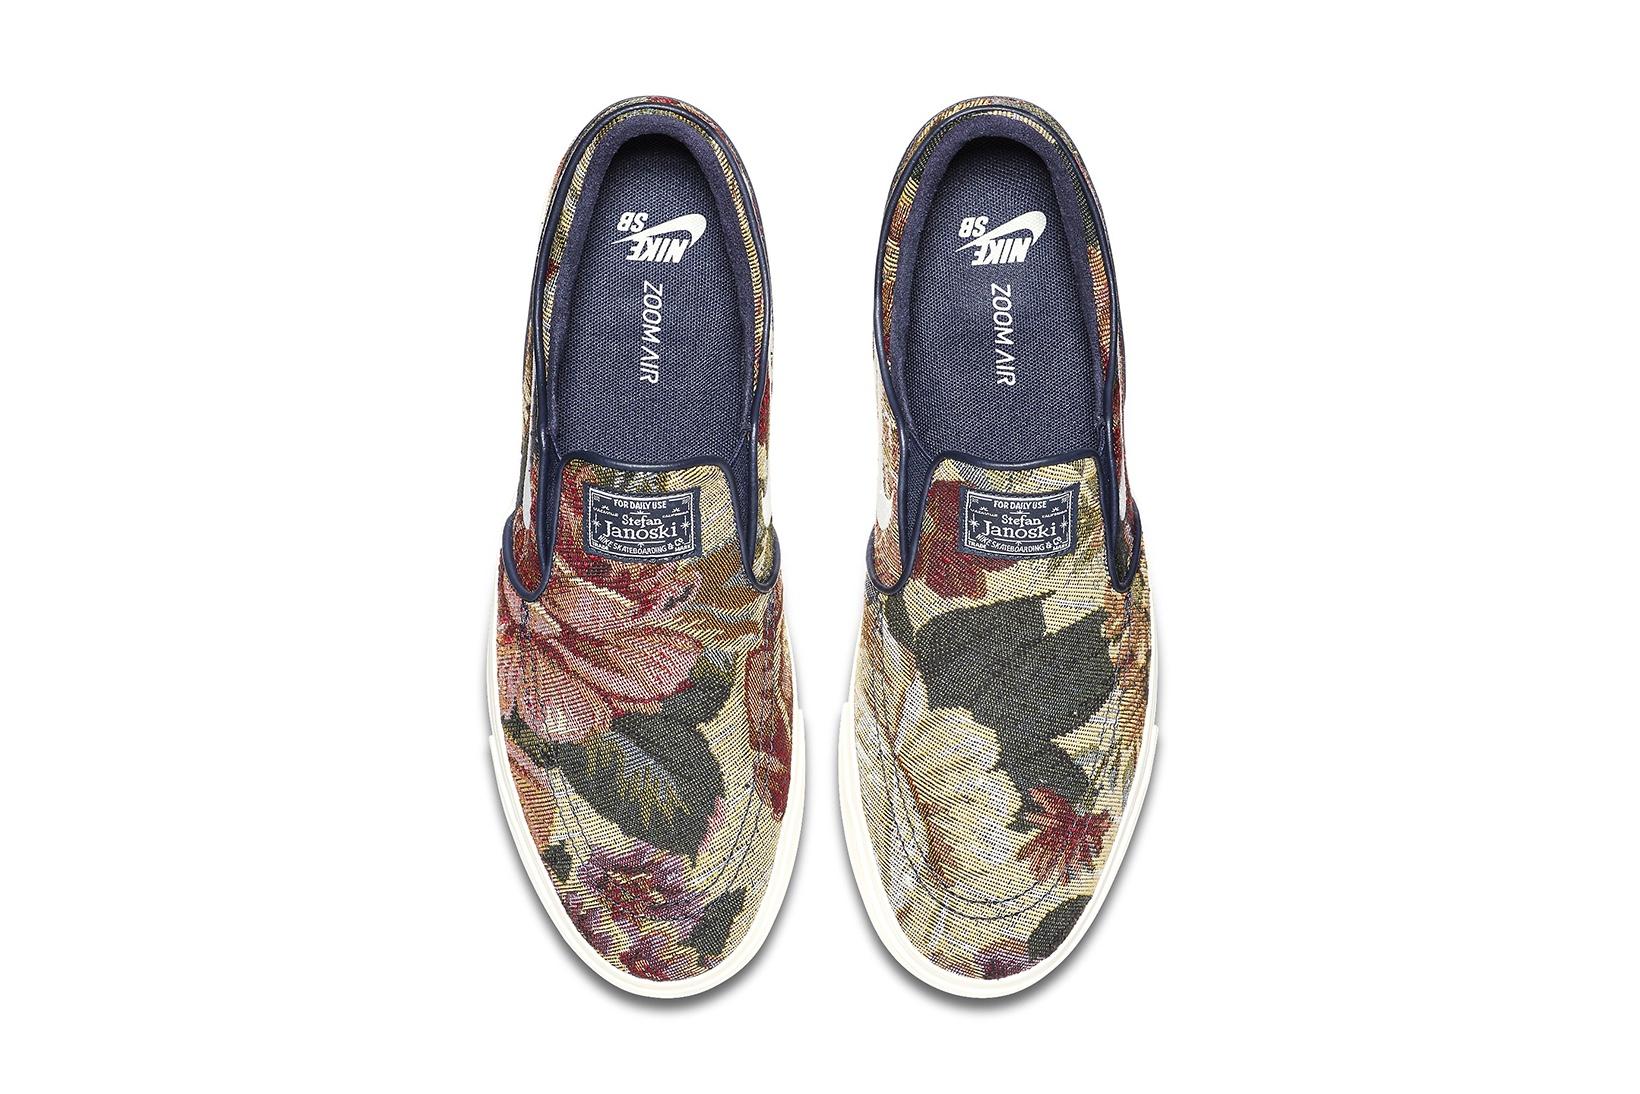 0a7186dc733 Slip-On Nike SBs Floral 3